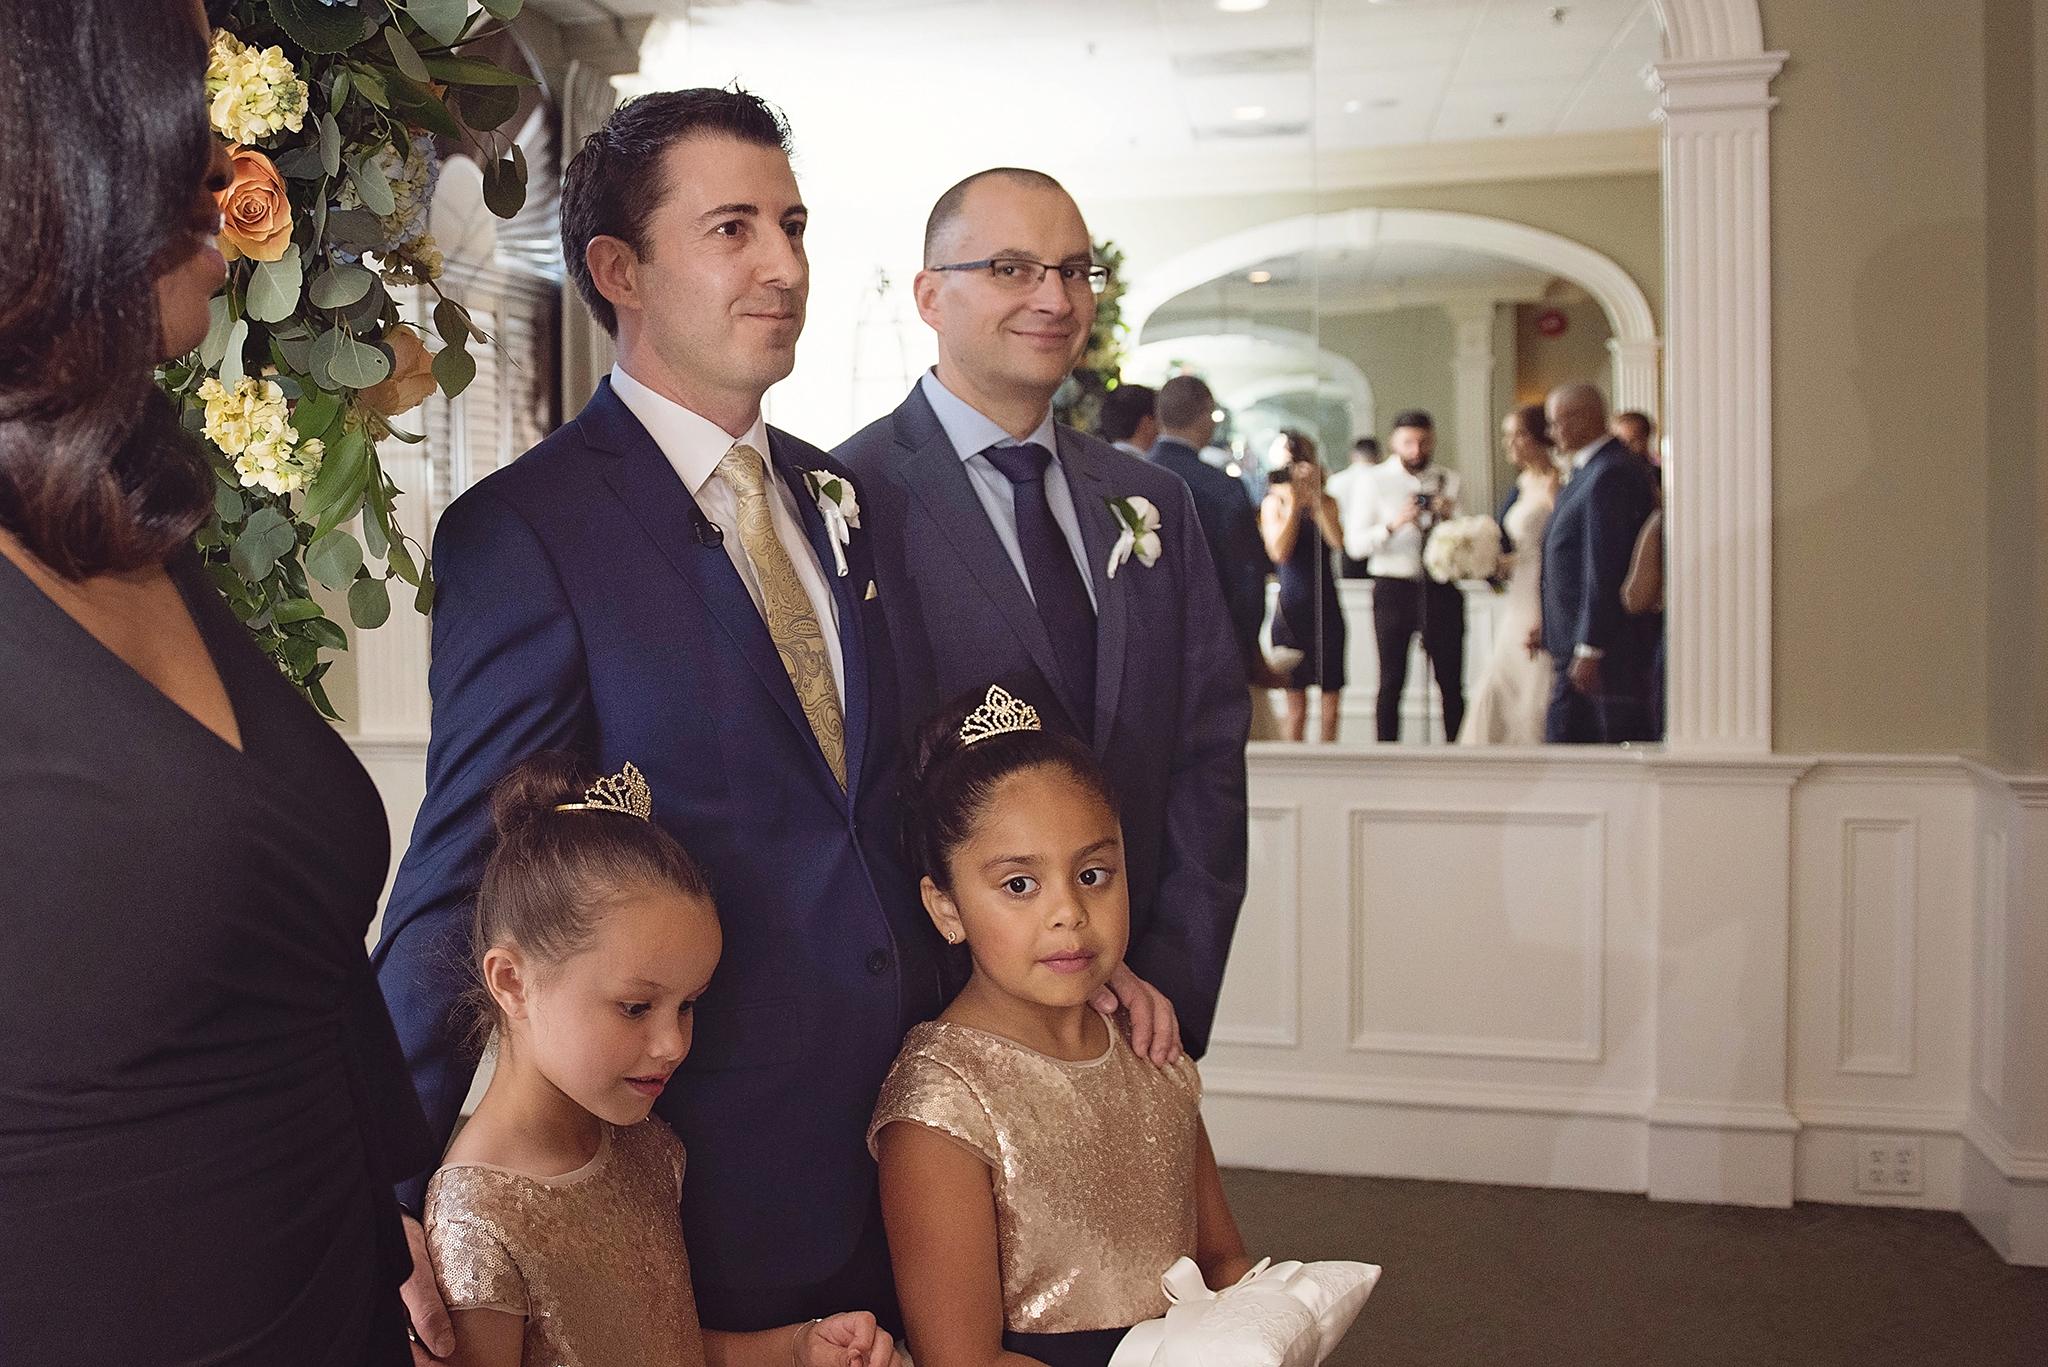 NJ-NY-wedding-photographer-045NJ-NY-wedding-photographer-045NJ-NY-WEDDING-PHOTOGRAPHER-045.JPG